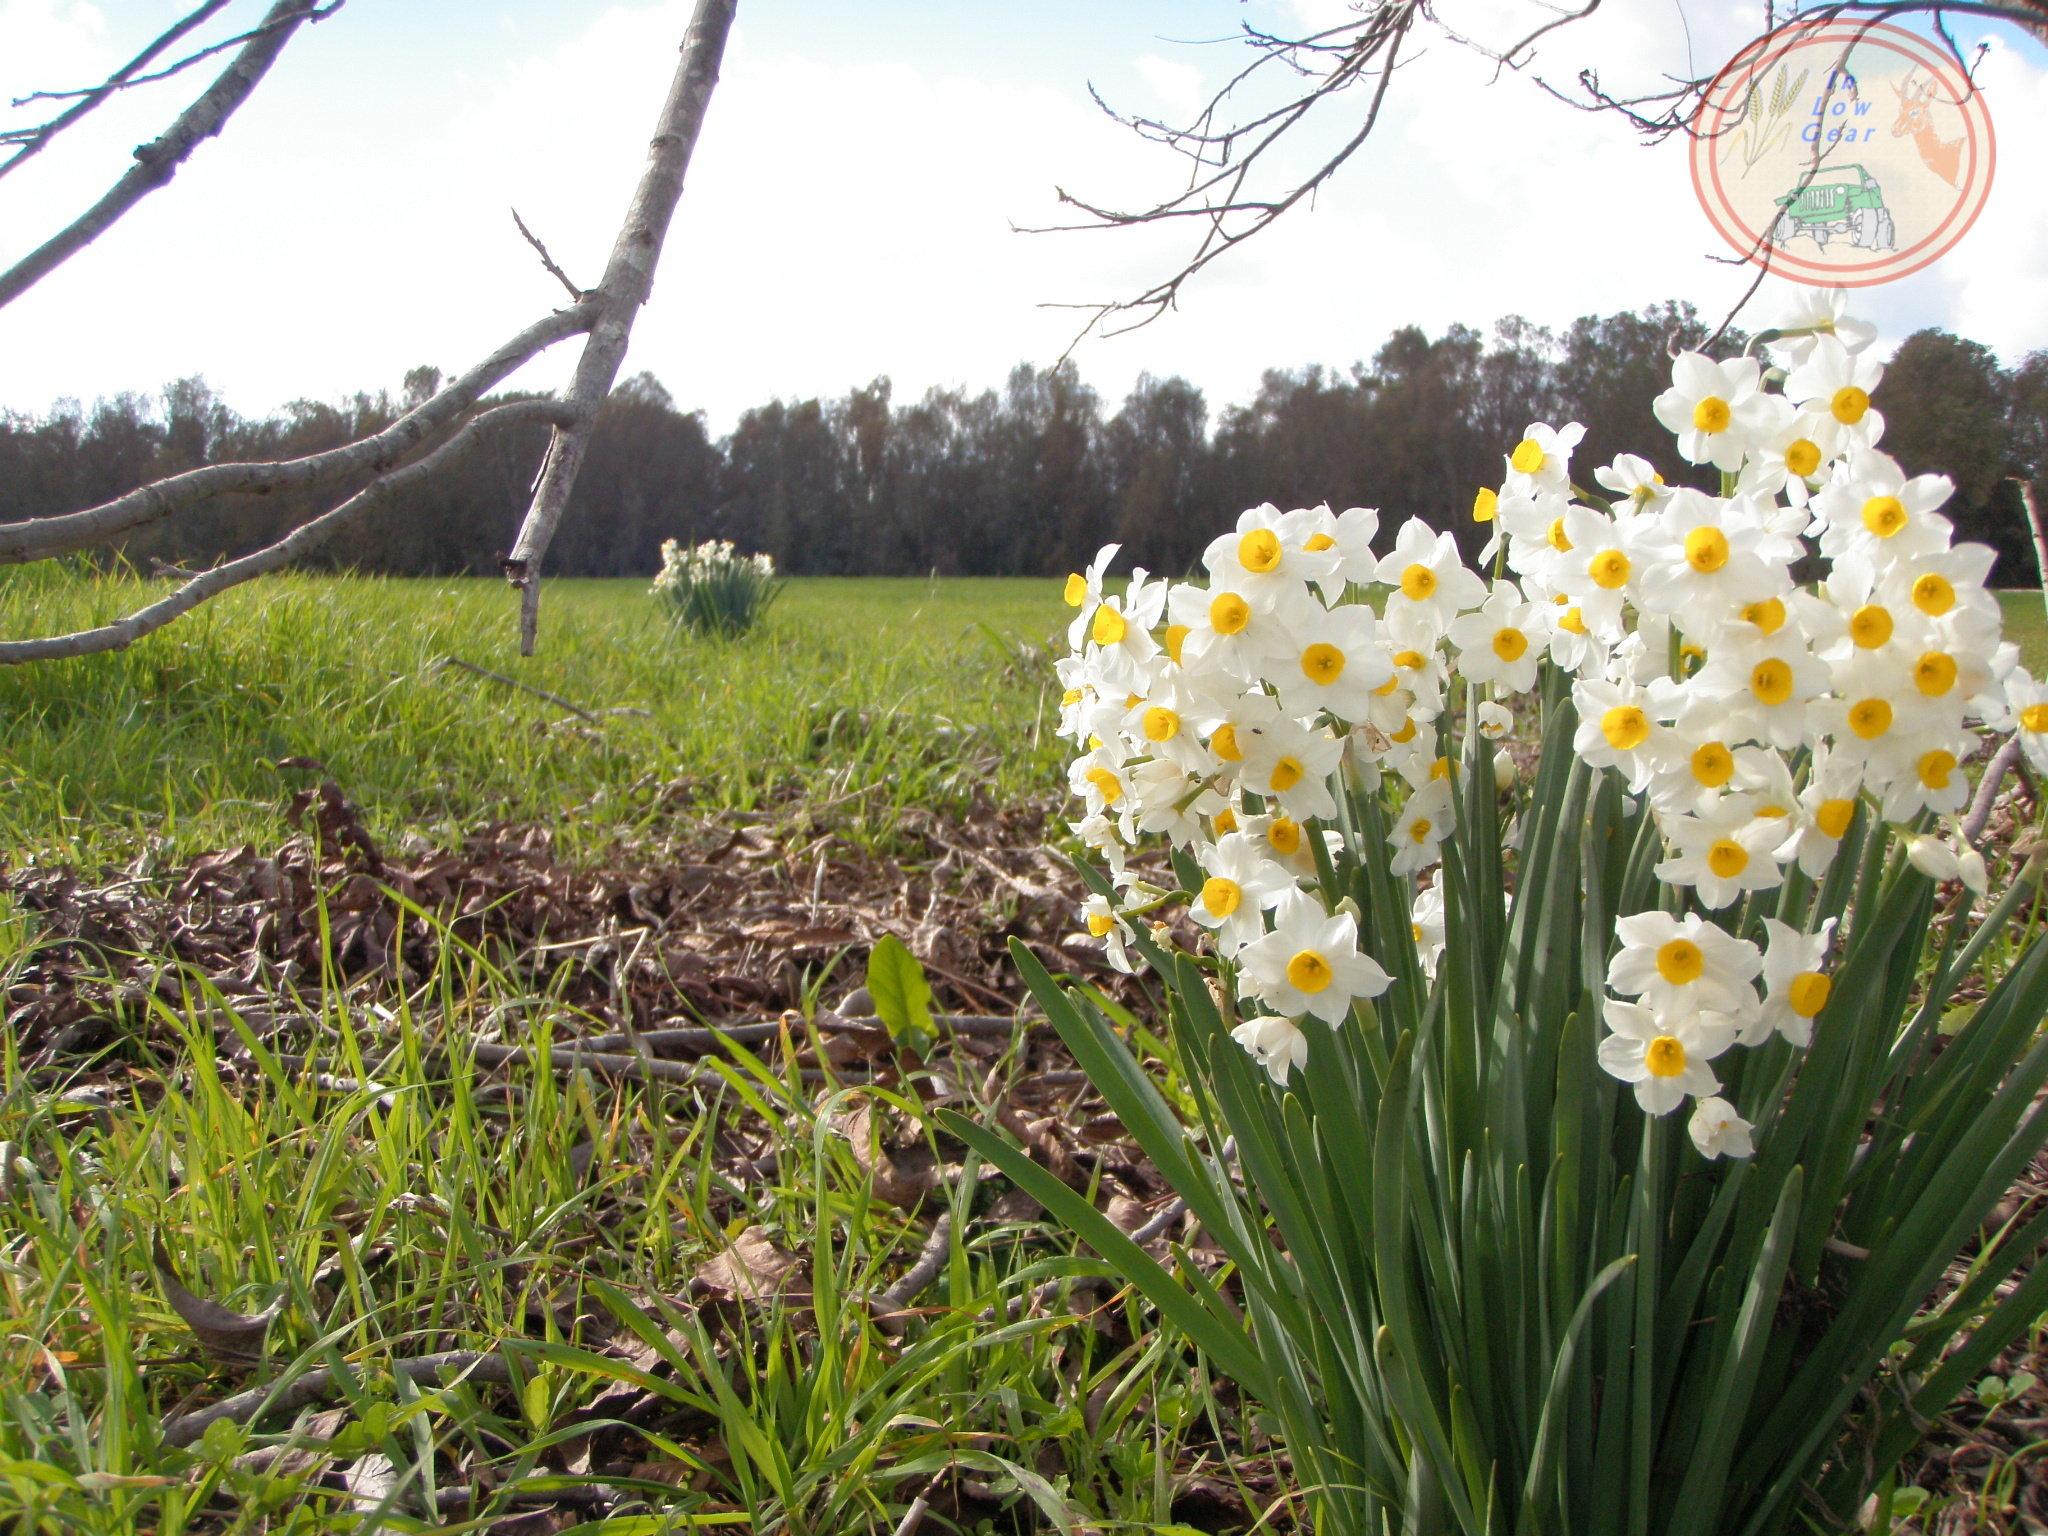 Common Narcissus Ness Ziona Jeep Tours. נרקיס מצוי בטיול ג'יפים סובב נס ציונה